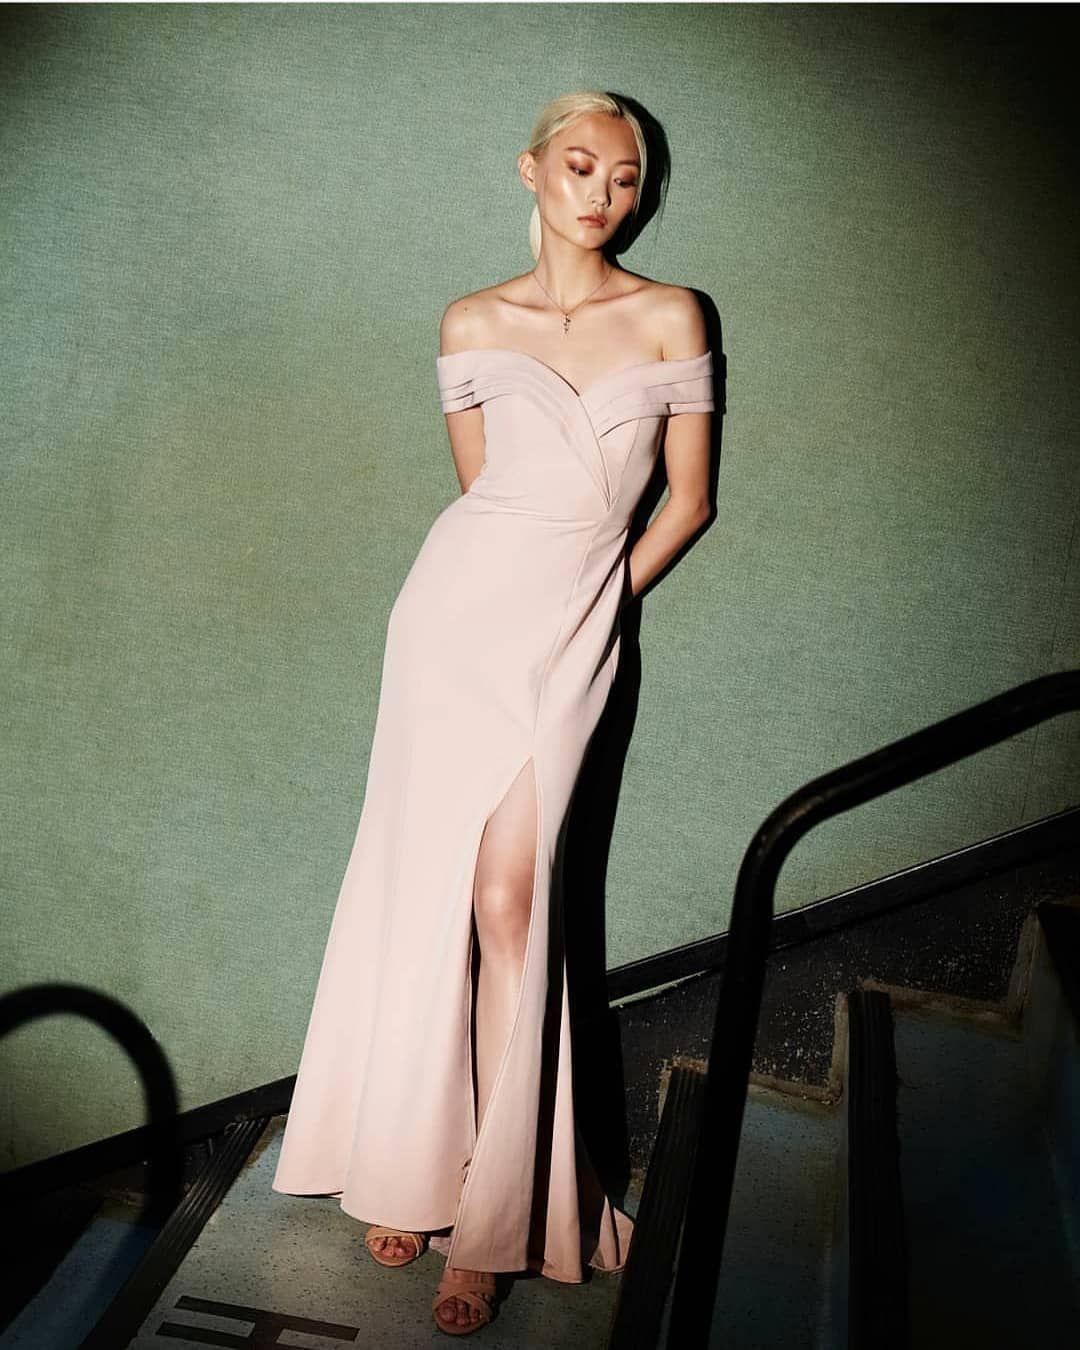 34dda9cab93 M A R I S O L E.  ootd  dress  promdress  wedding  bridesmaids   bridesmaiddresses  jarlolondon  offshoulderdress  bridal  weddingoutfit   occasionwear ...